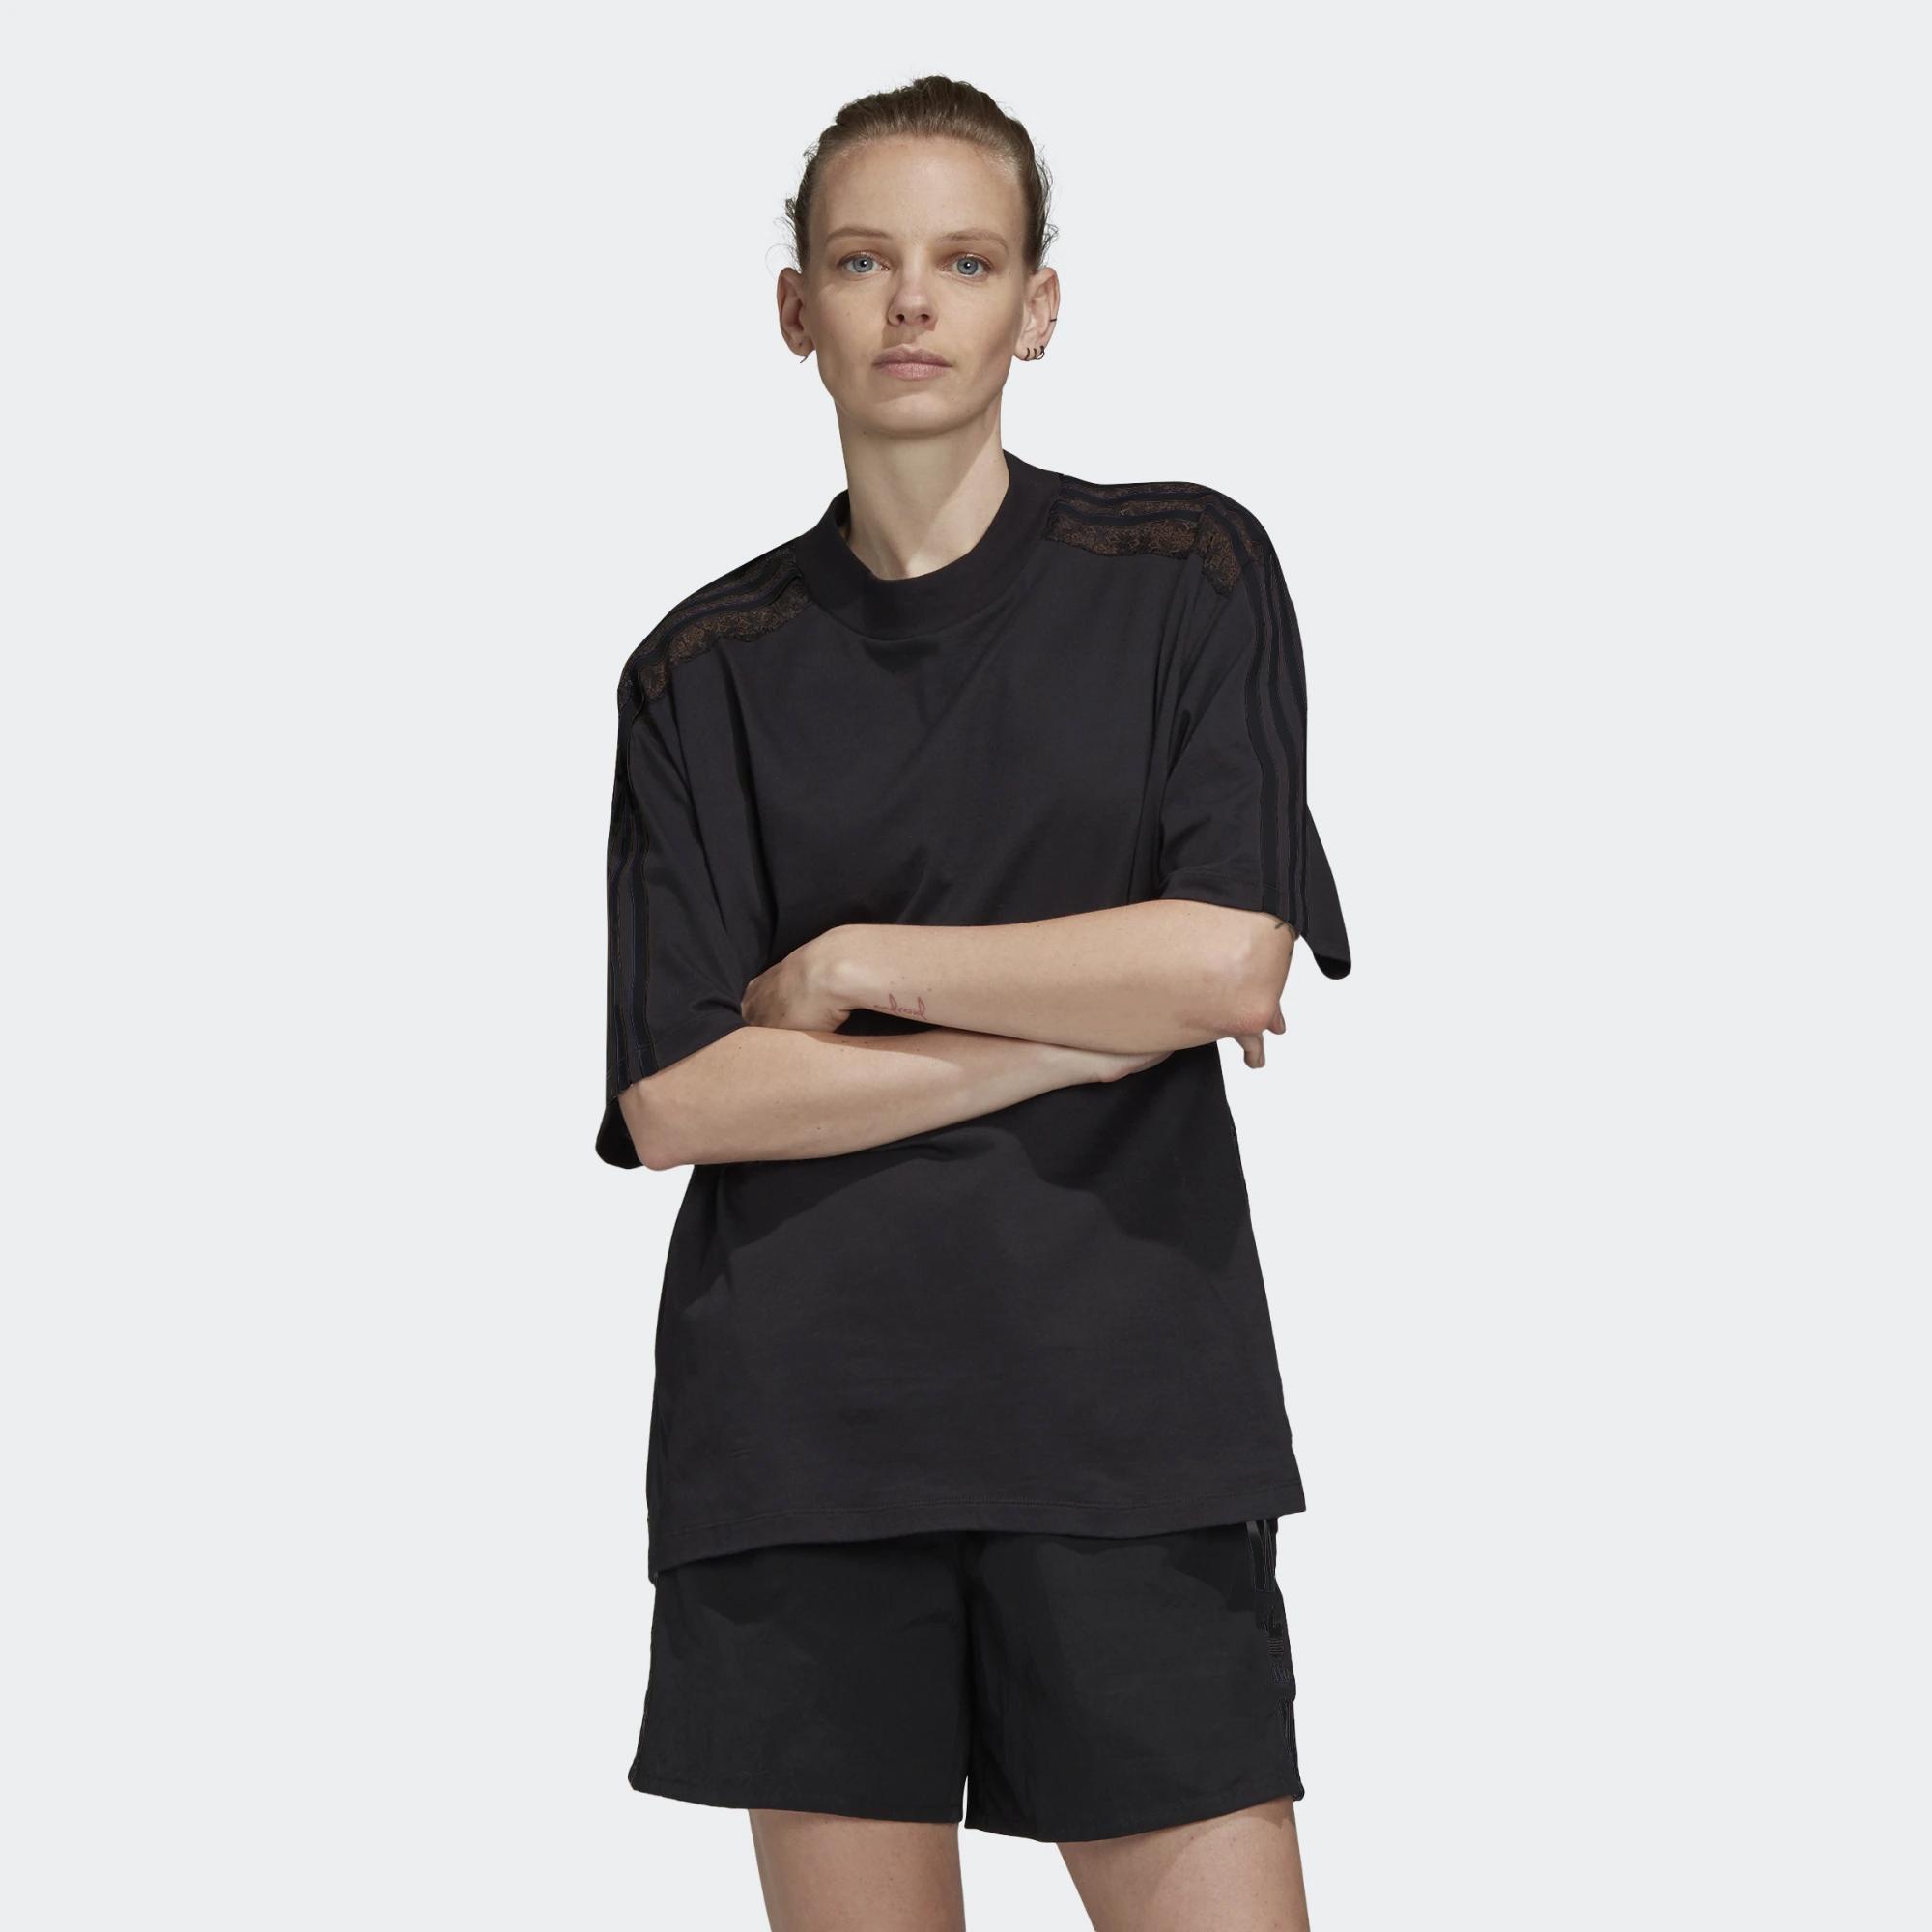 adidas Original Lace Back Women's T-shirt (9000045428_1469)